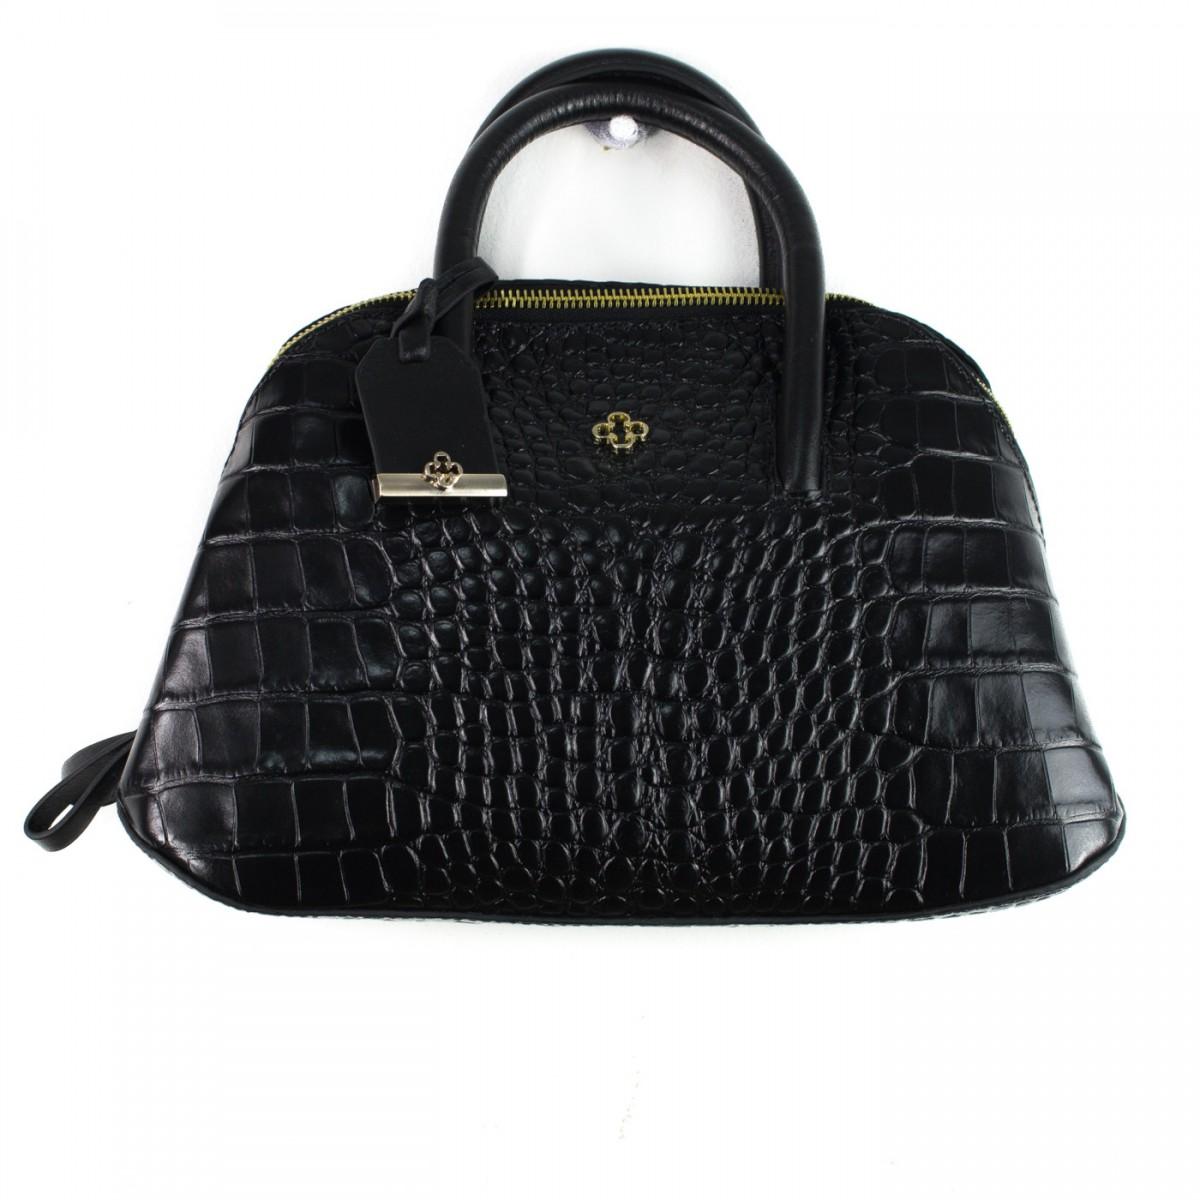 Bolsa Feminina De Couro Capodarte : Bizz store bolsa feminina capodarte croco couro preta